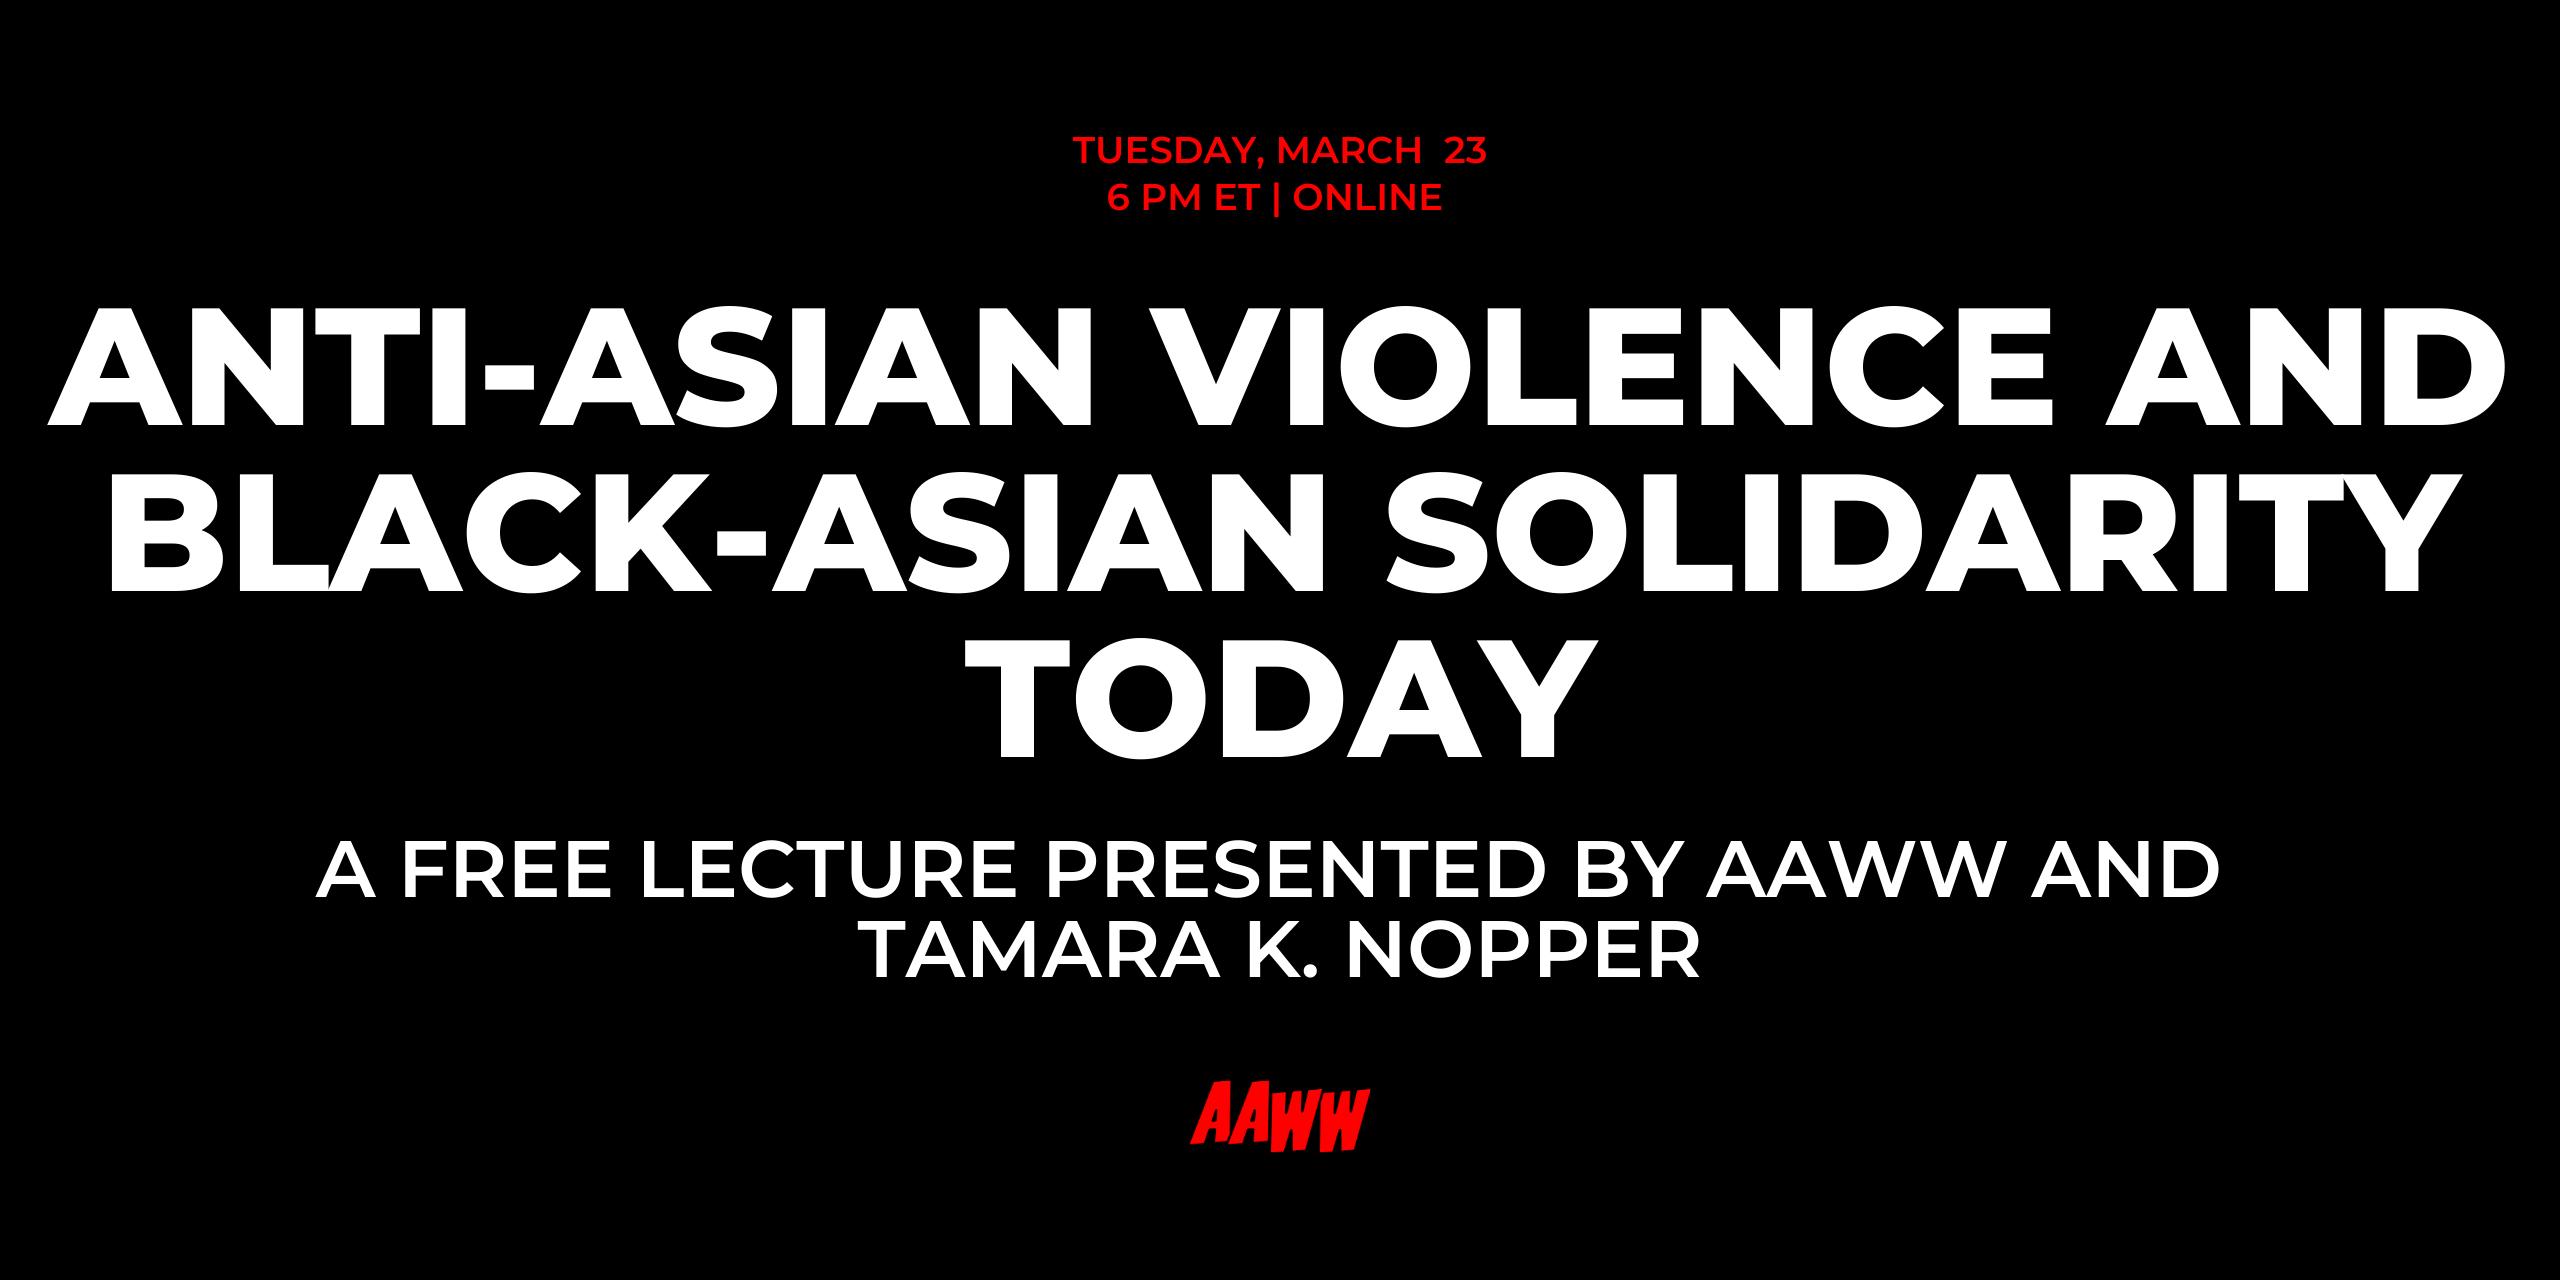 Anti-Asian Violence and Black-Asian Solidarity Today